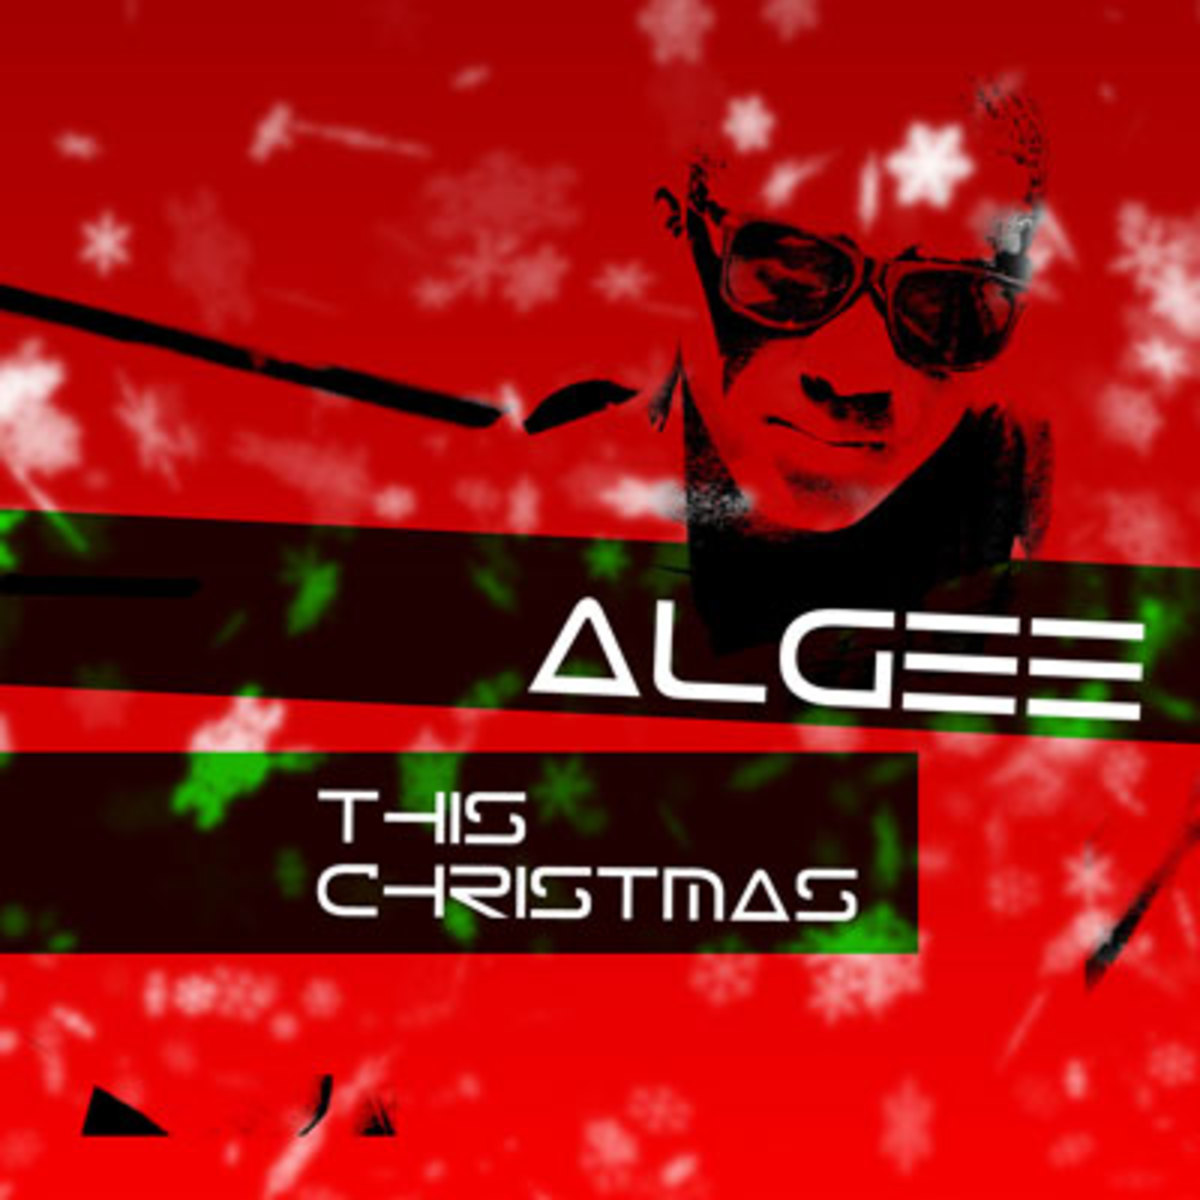 algee-thischristmas.jpg